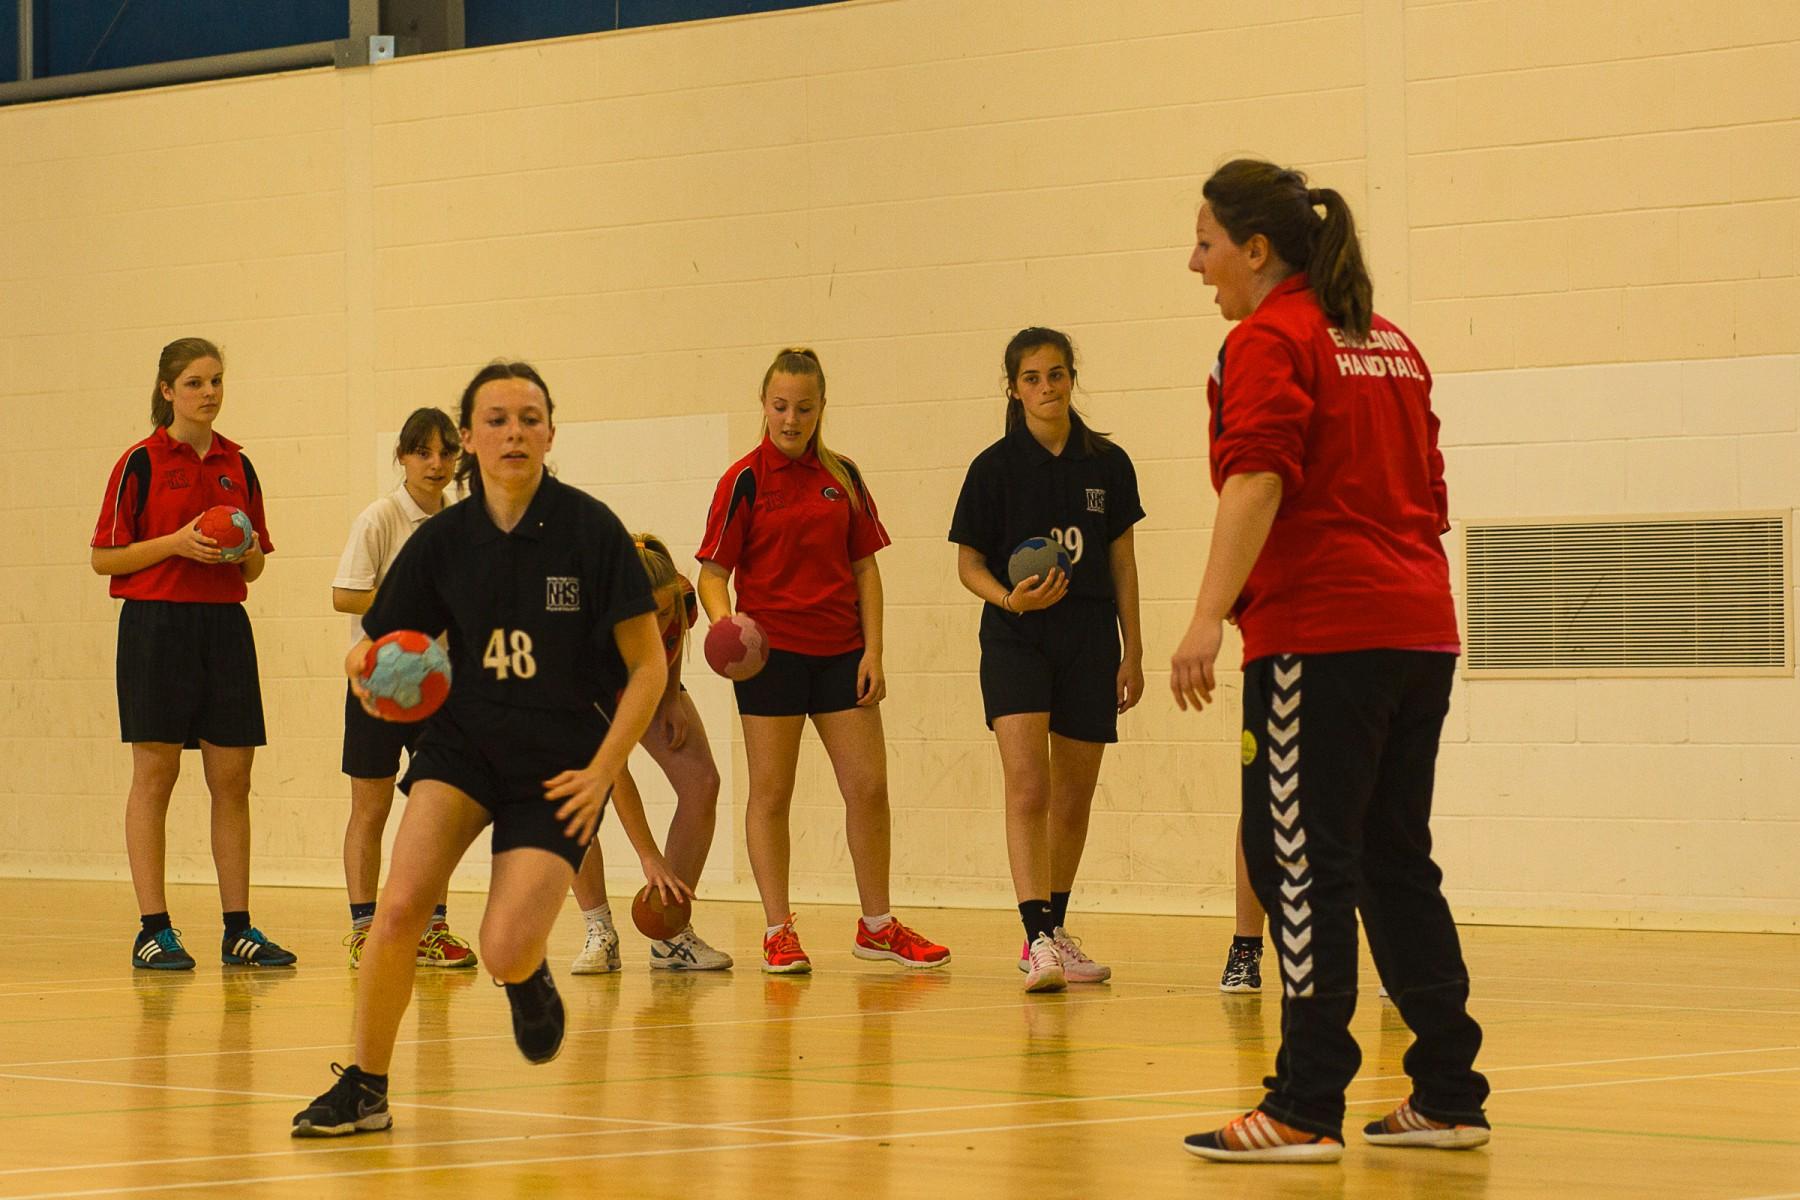 high school and handball Welcome sask team handball (saskatchewan team handball federation inc)  is the sport governing body for team handball in the province of saskatchewan.